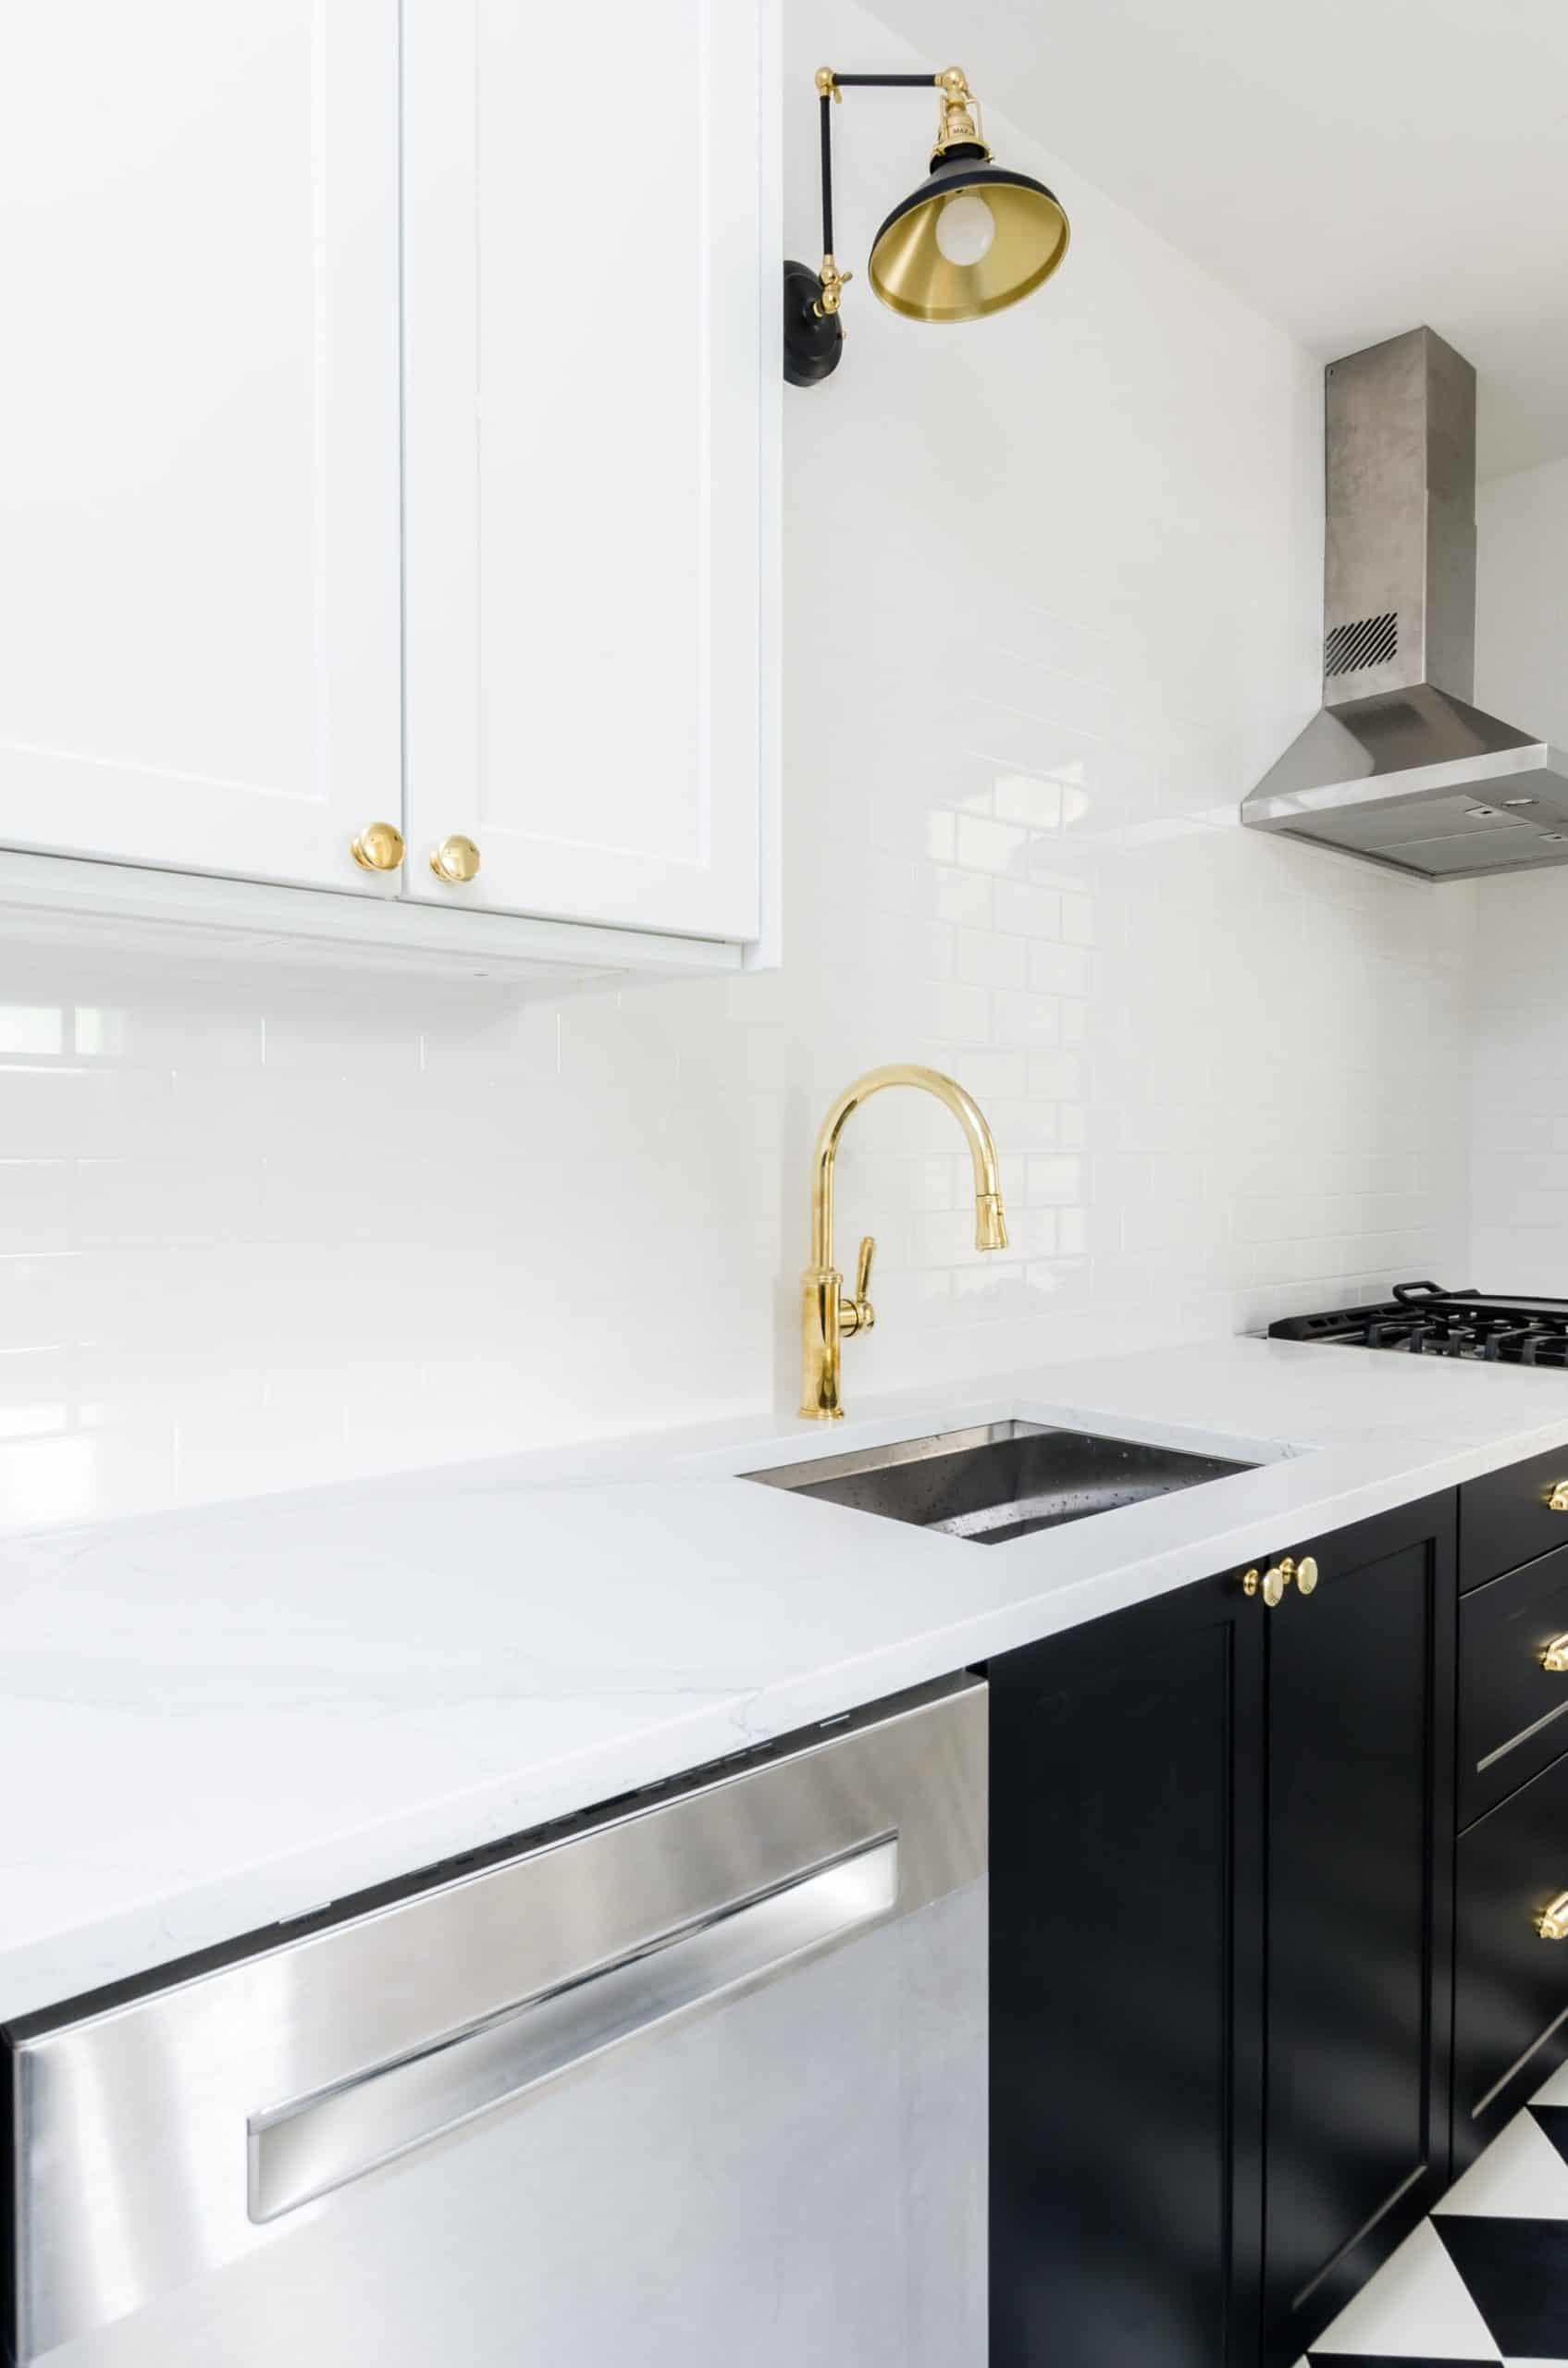 Gold Kitchen Faucet Paired with a Minimalist Undermount Sink kitchen sink ideas